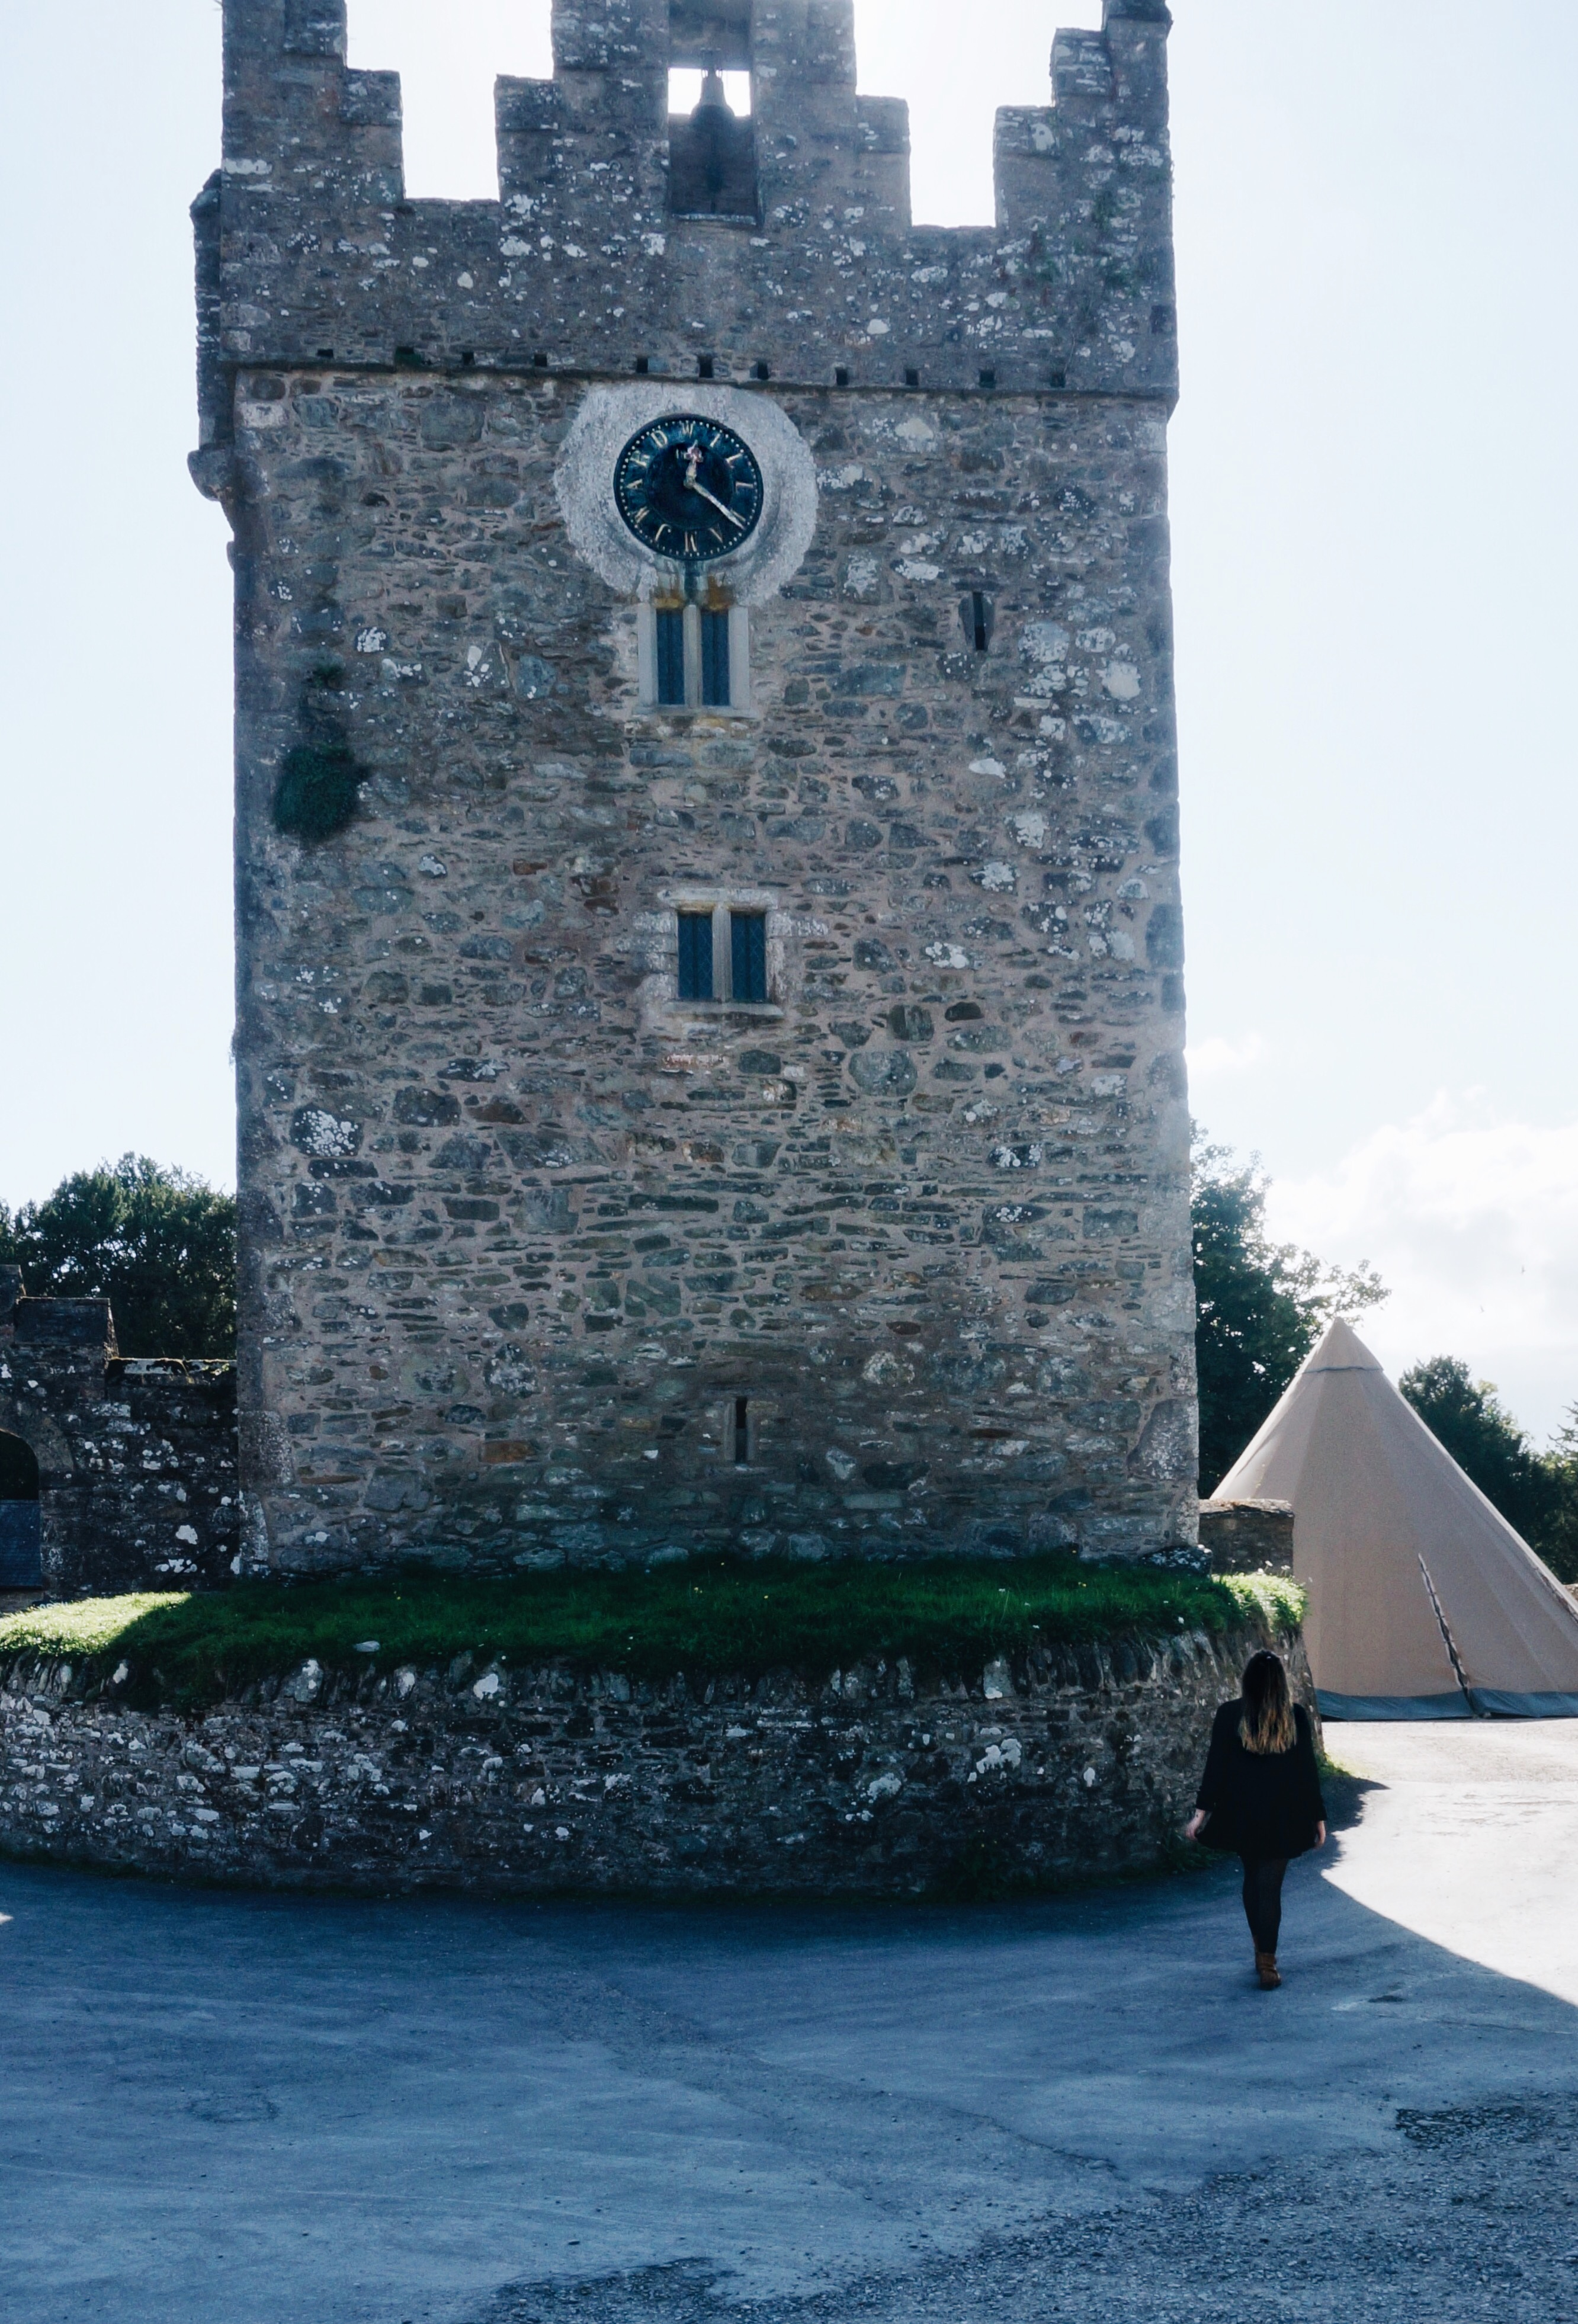 Nordirland, Winterfell, Game of Thrones Drehorte,